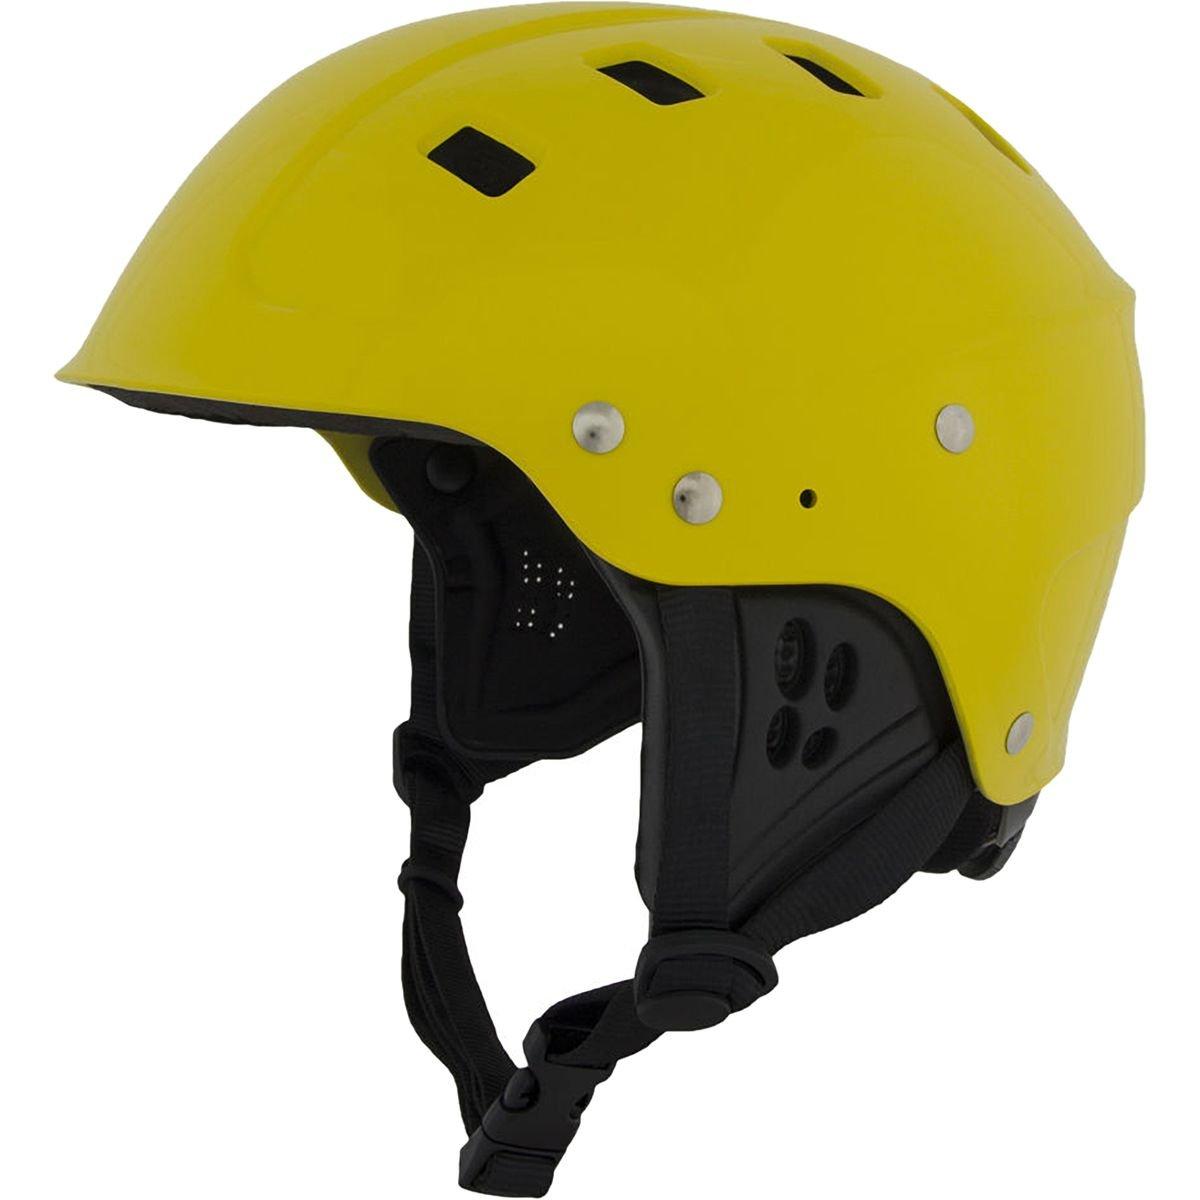 NRS Chaos Side Cut Helmet Yellow Medium by NRS